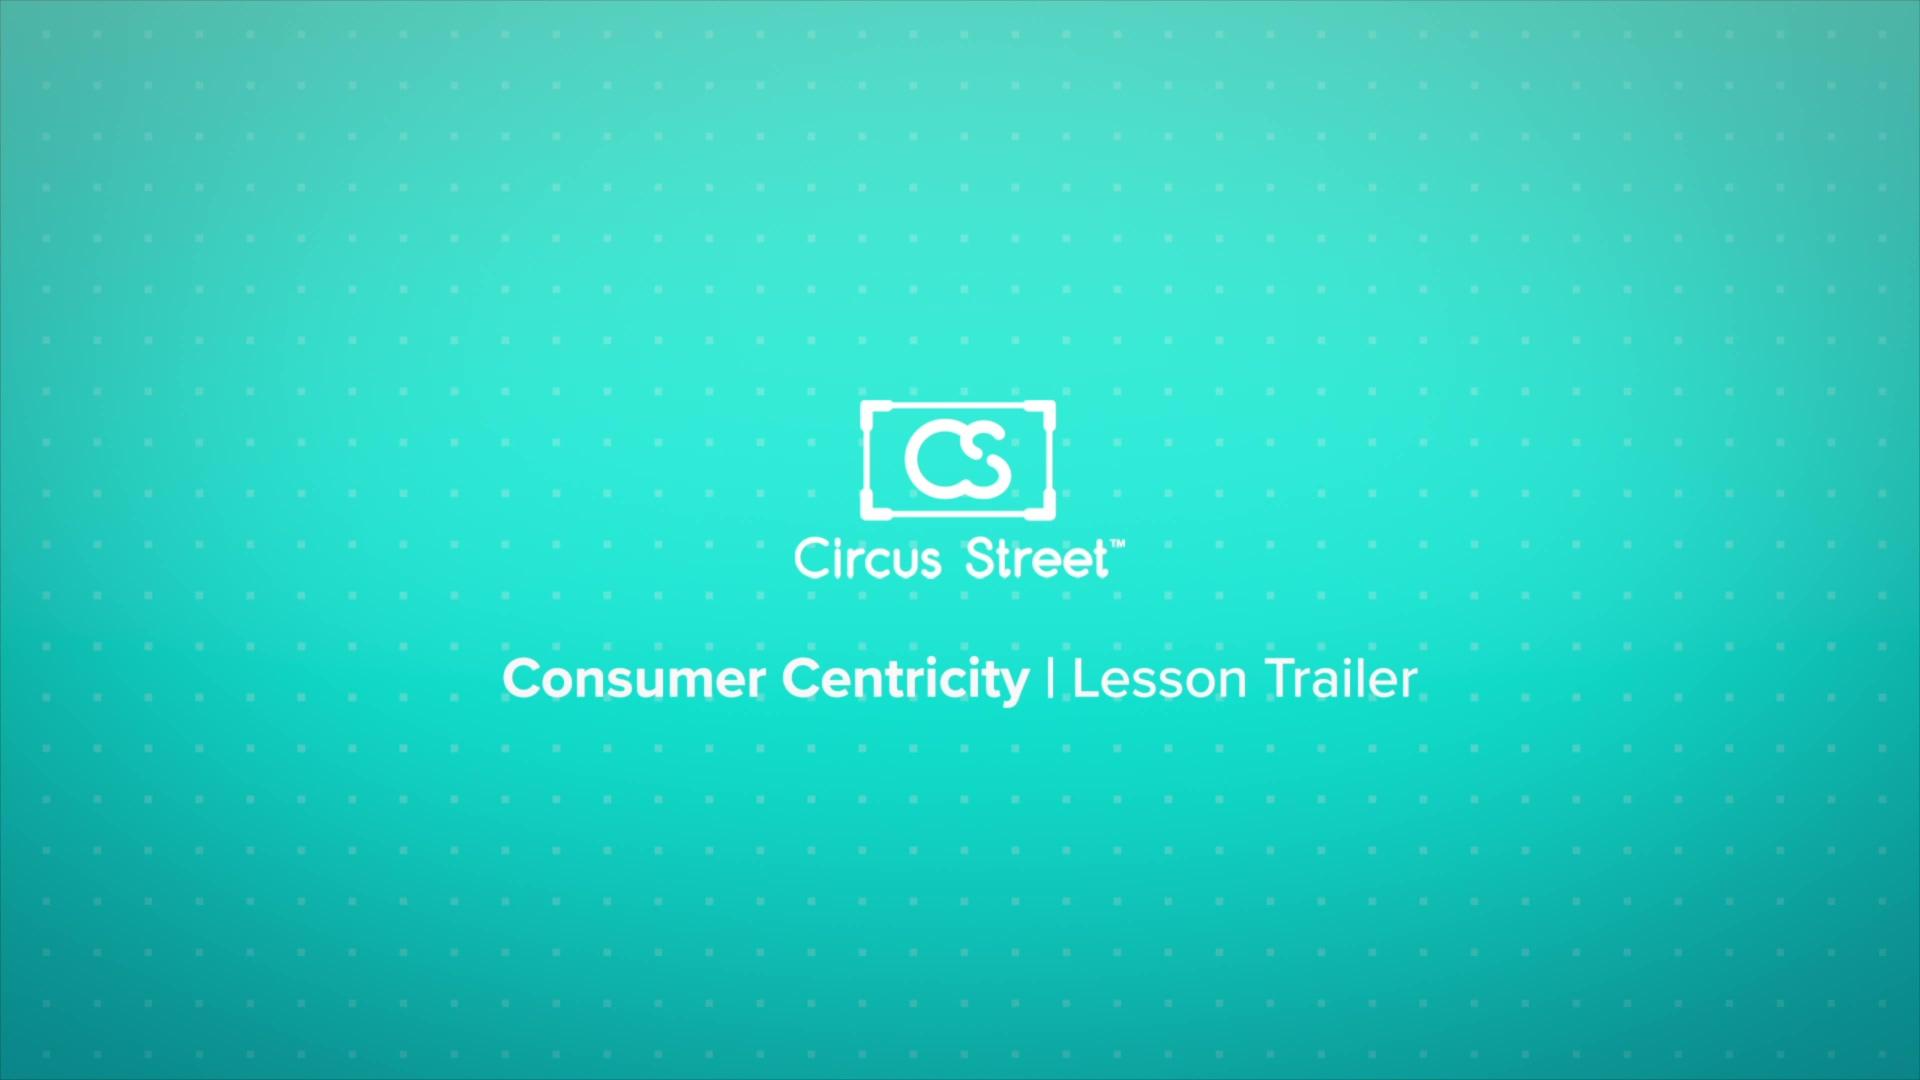 Consumer Centricity Trailer